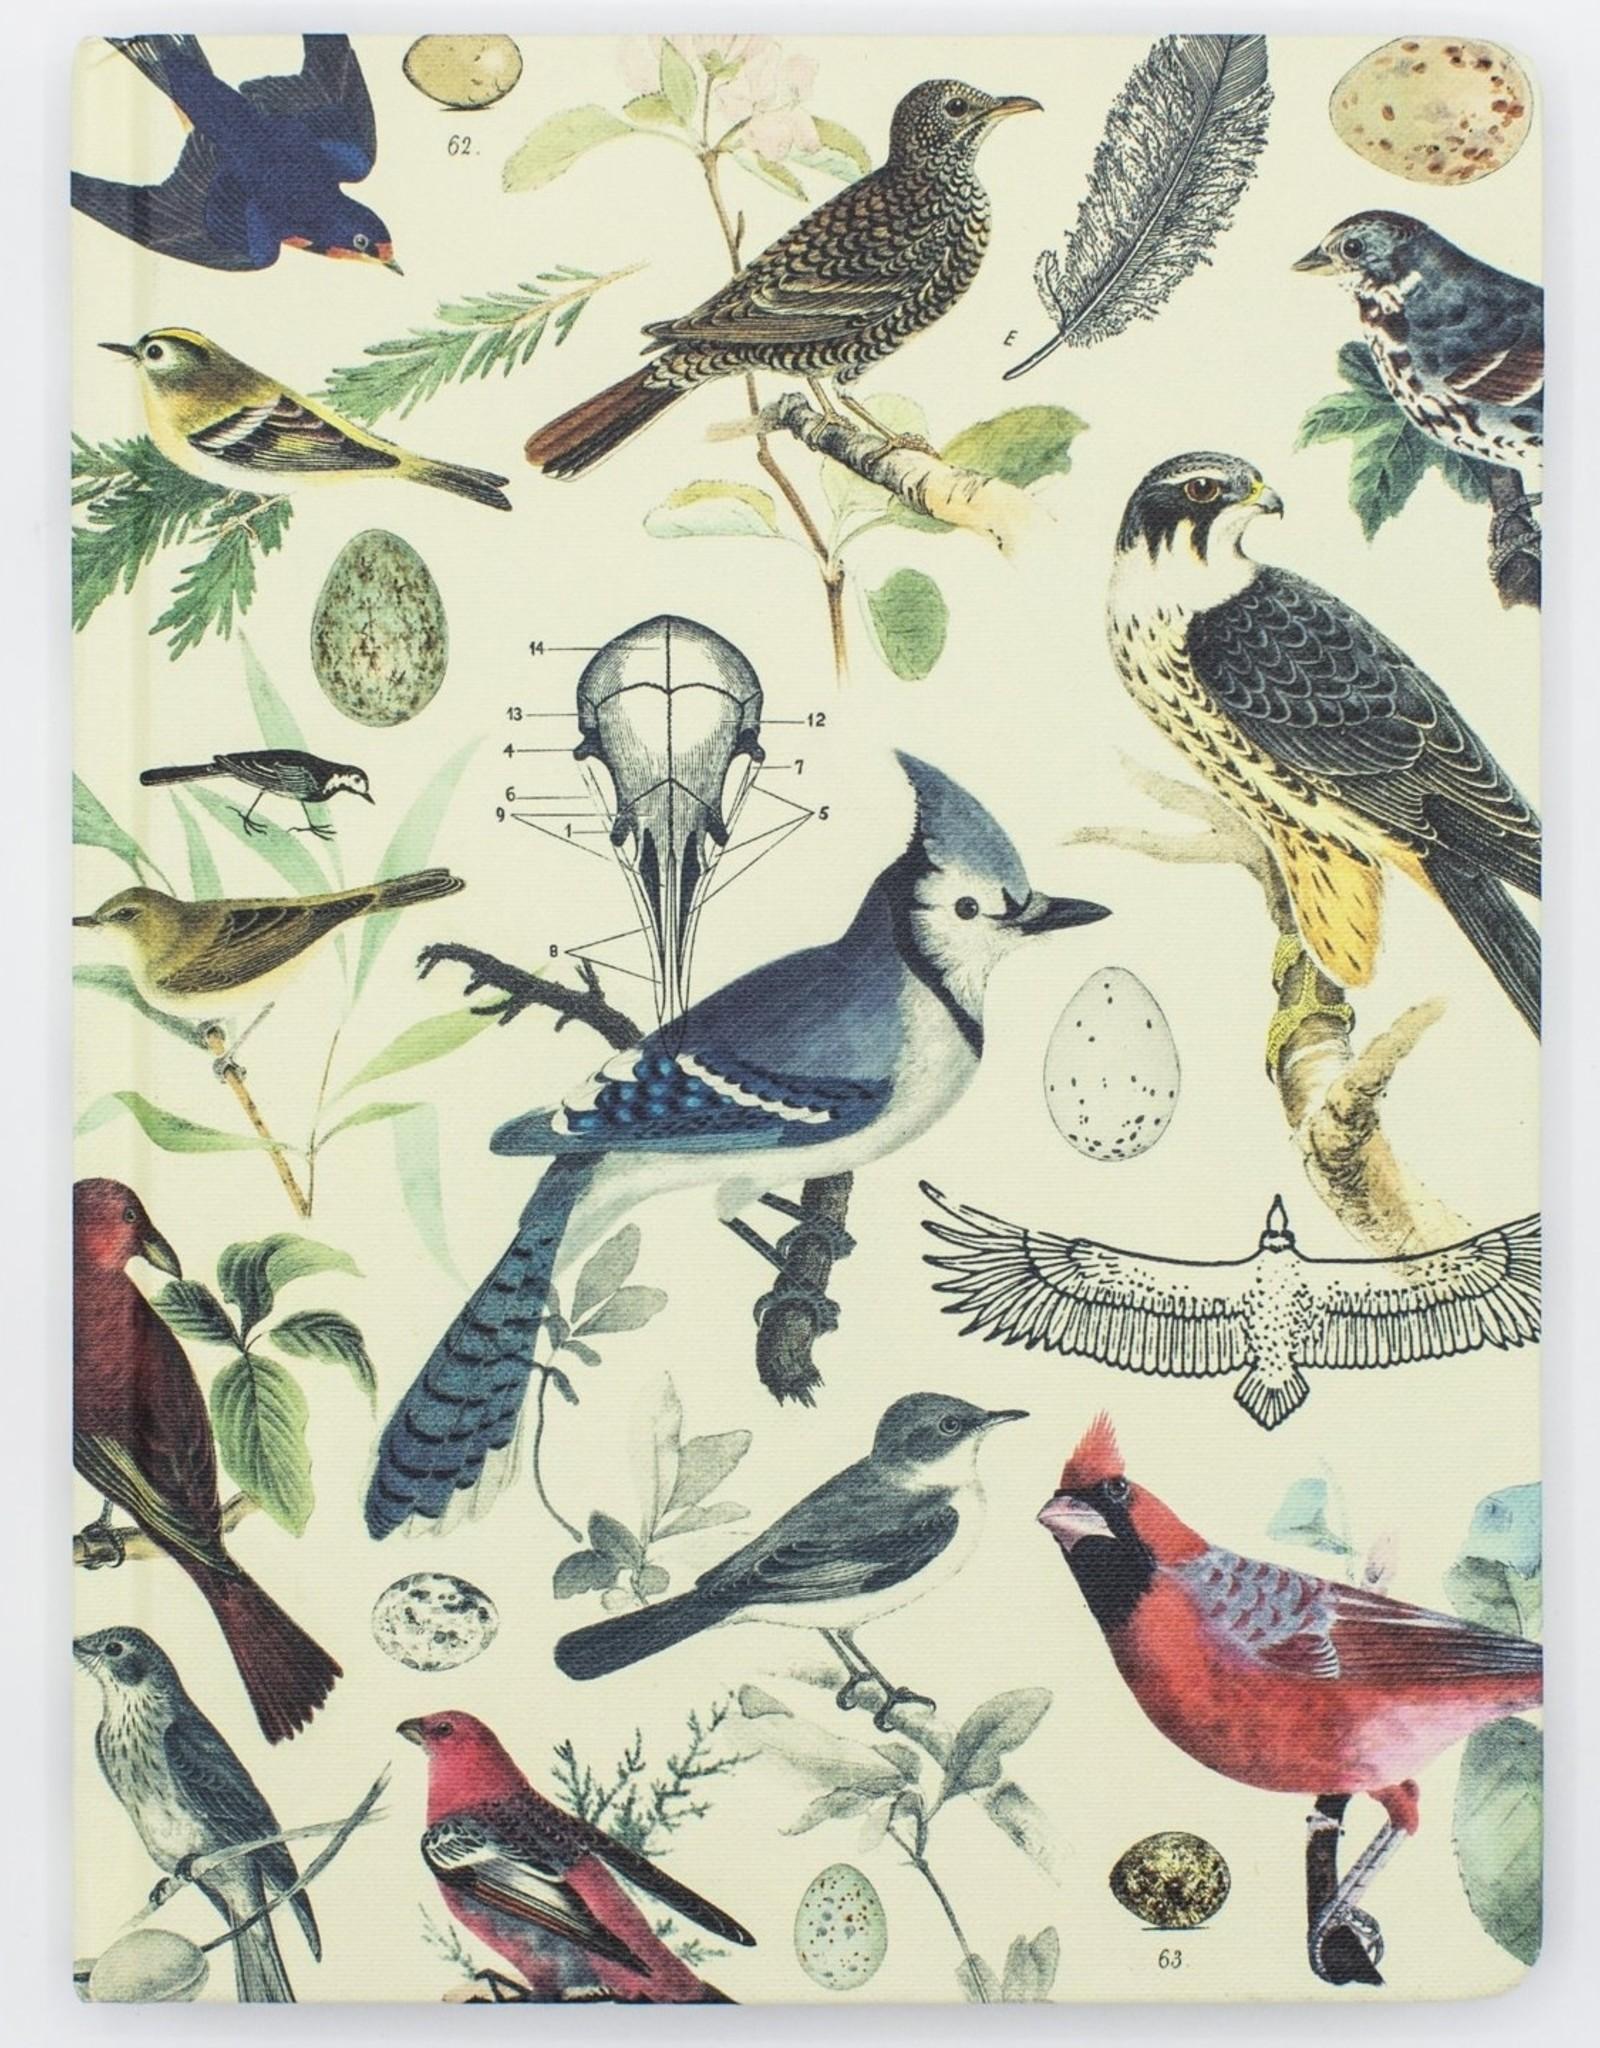 JOURNAL-LINED/GRID-ORNITHOLOGY BIRDS